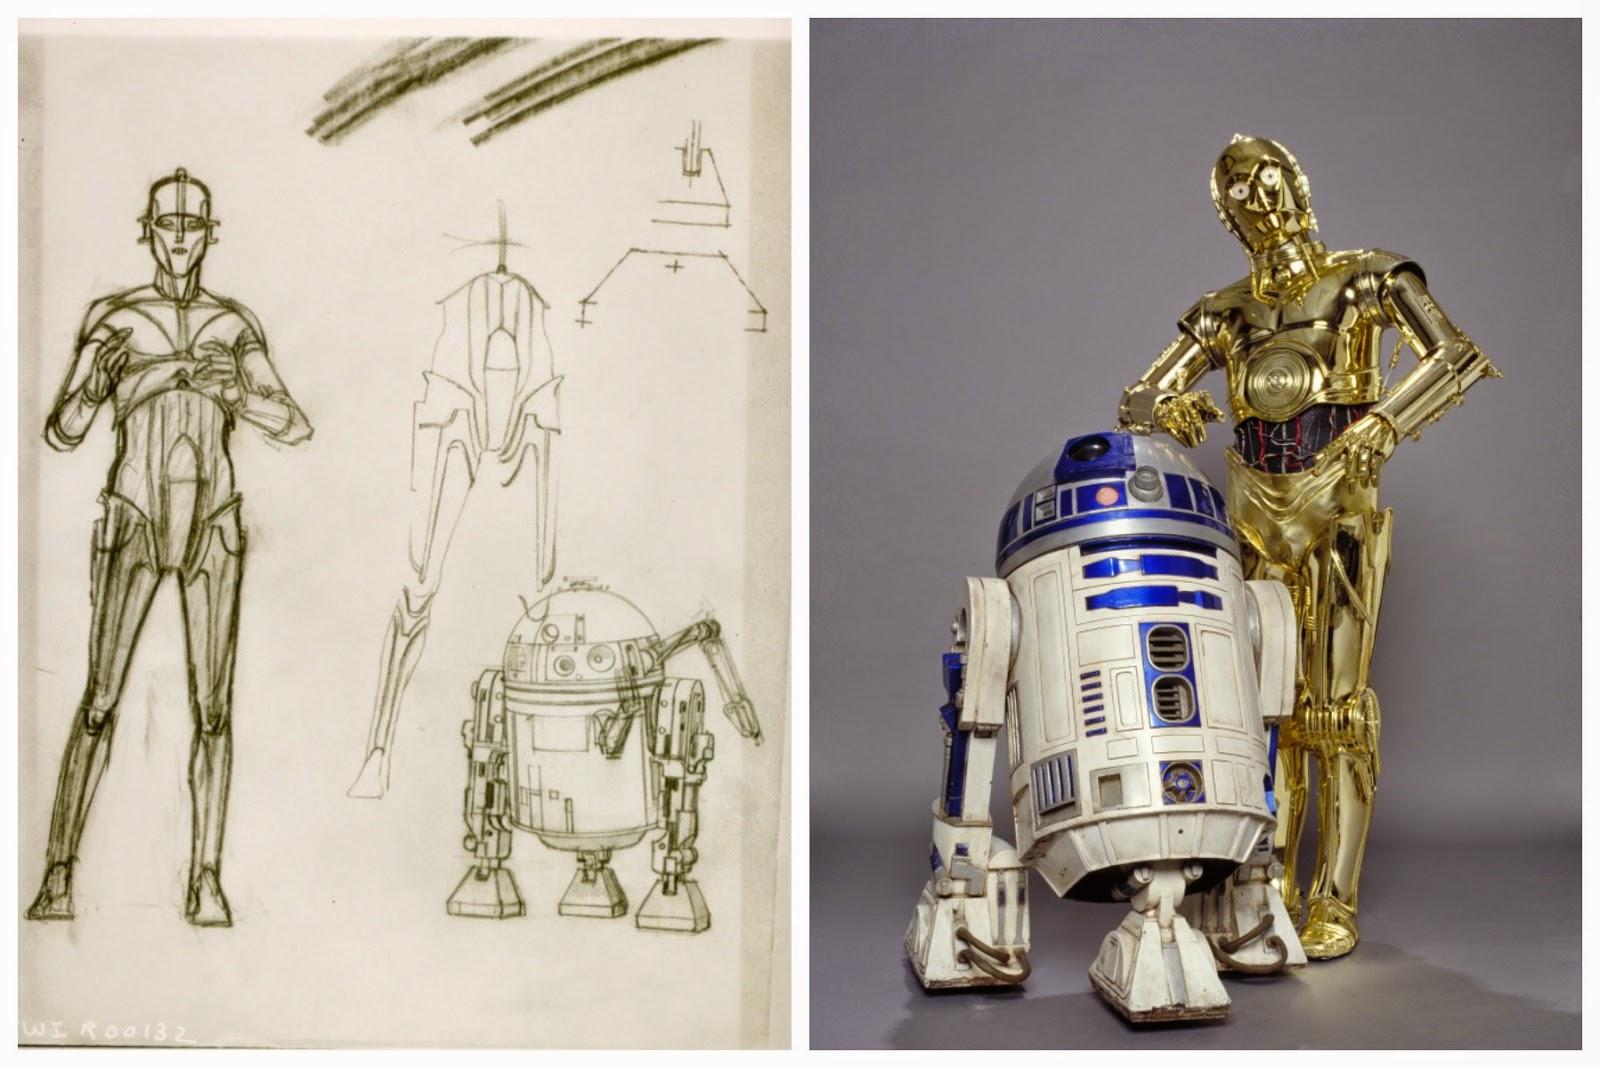 R2-D2_C-3PO-Concept.jpg